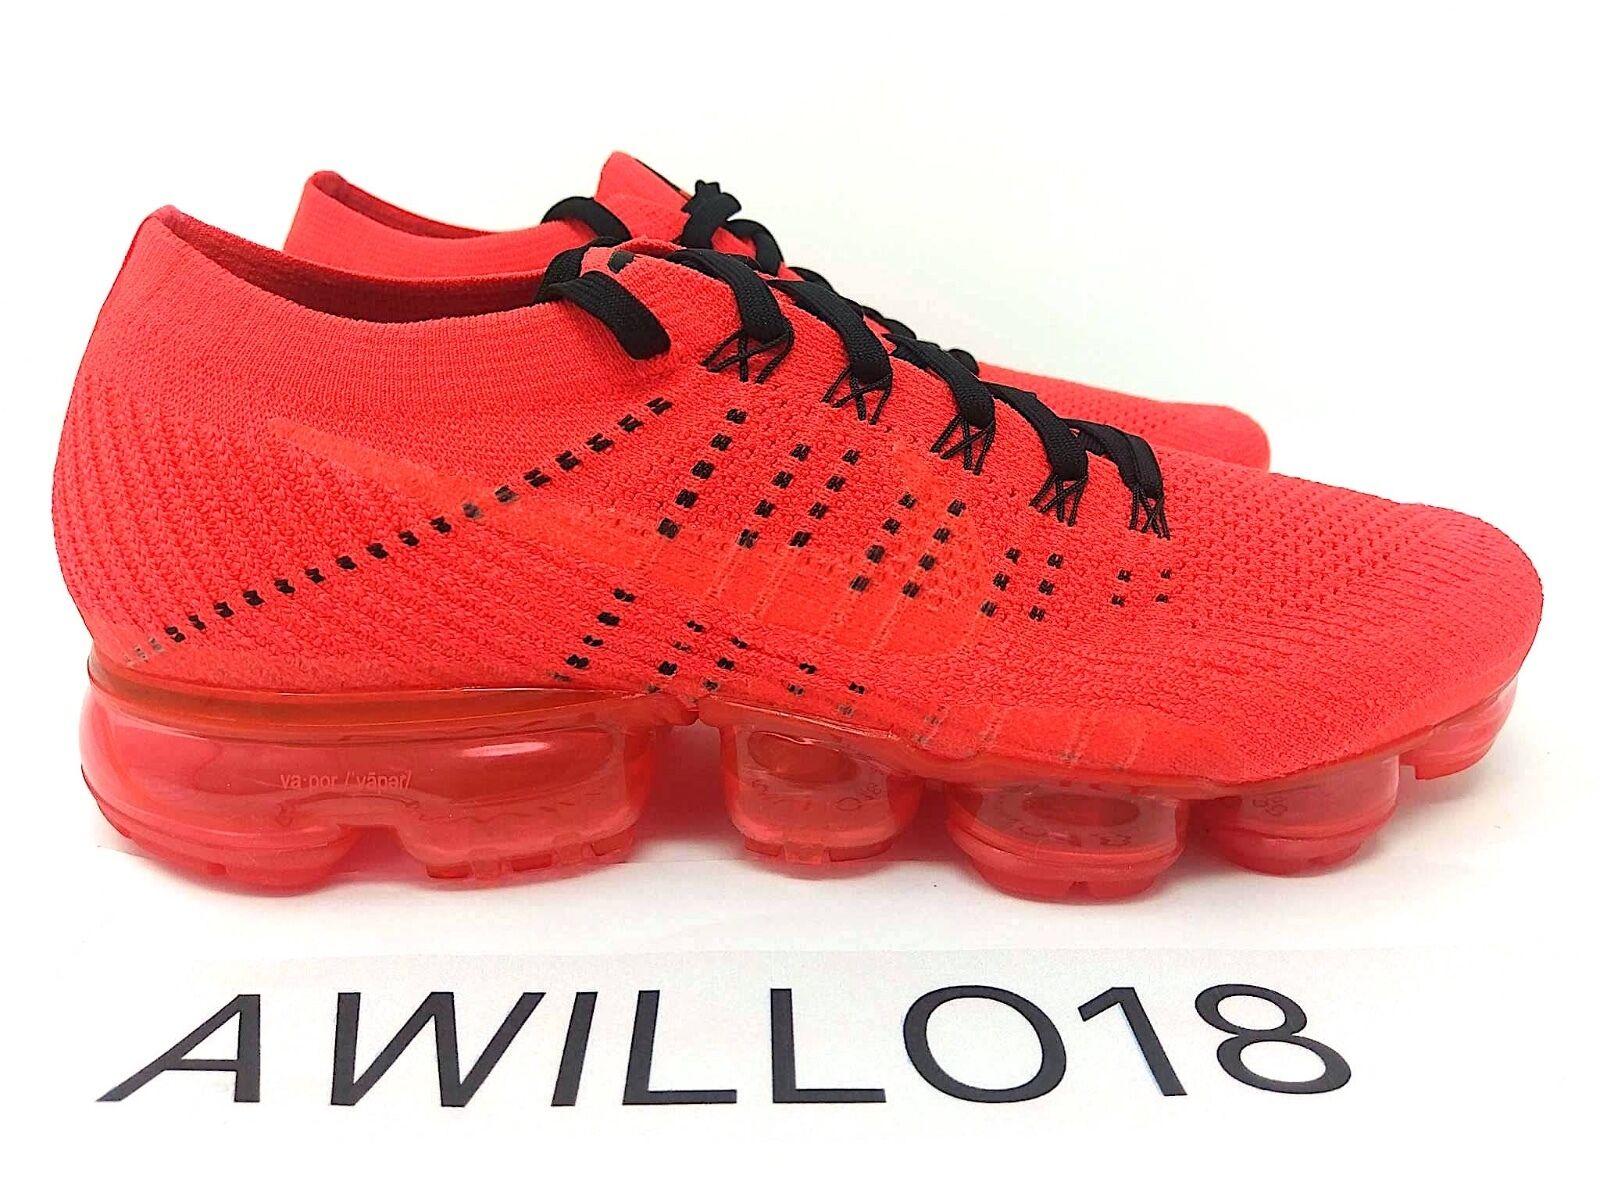 Nike x Clot Air Vapormax Flyknit Bright Crimson Red Black US